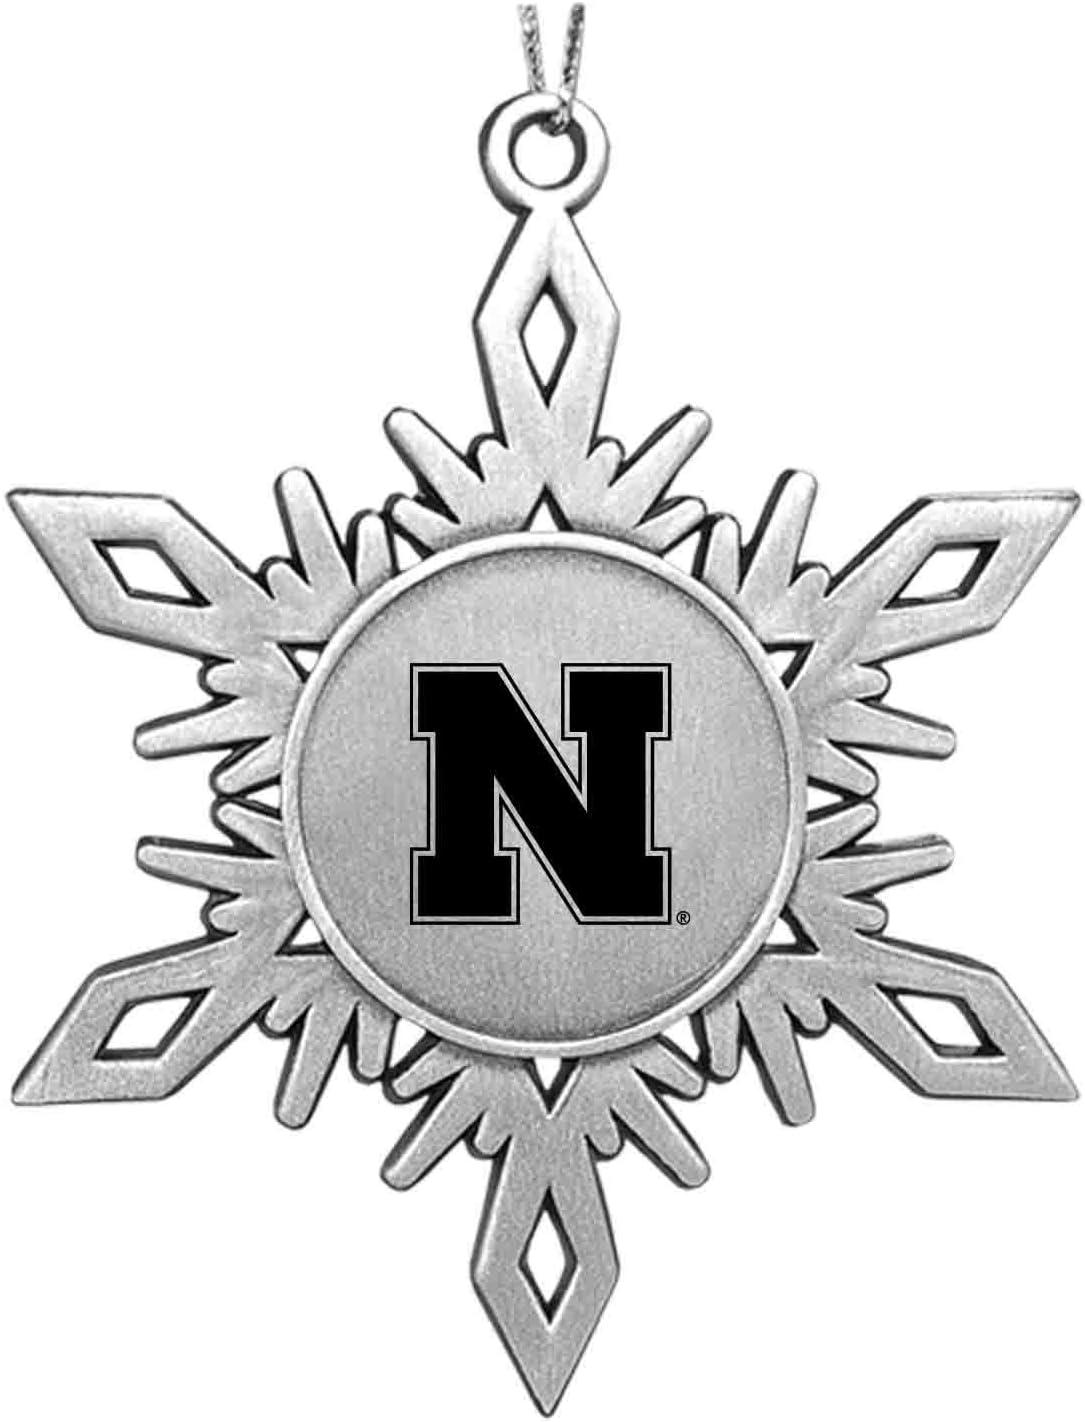 University of Nebraska|Snowflake Ornament|Pewter LXG Inc